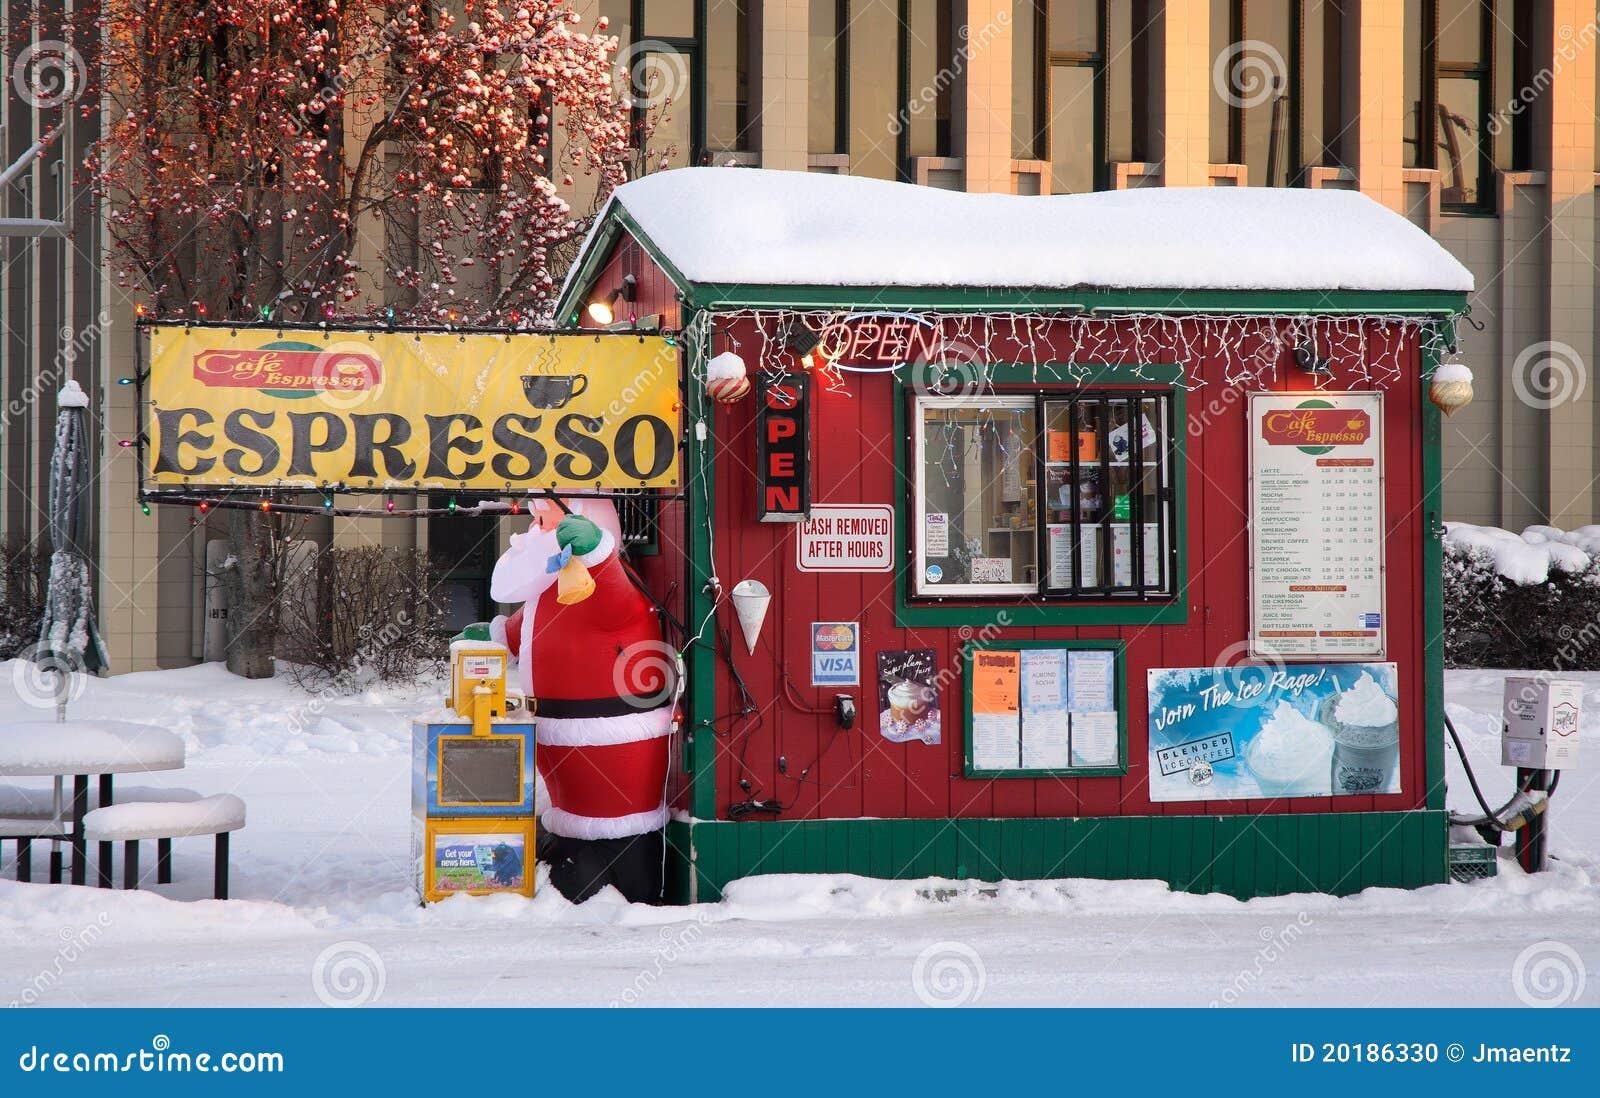 Картинки по запросу кофе аляски